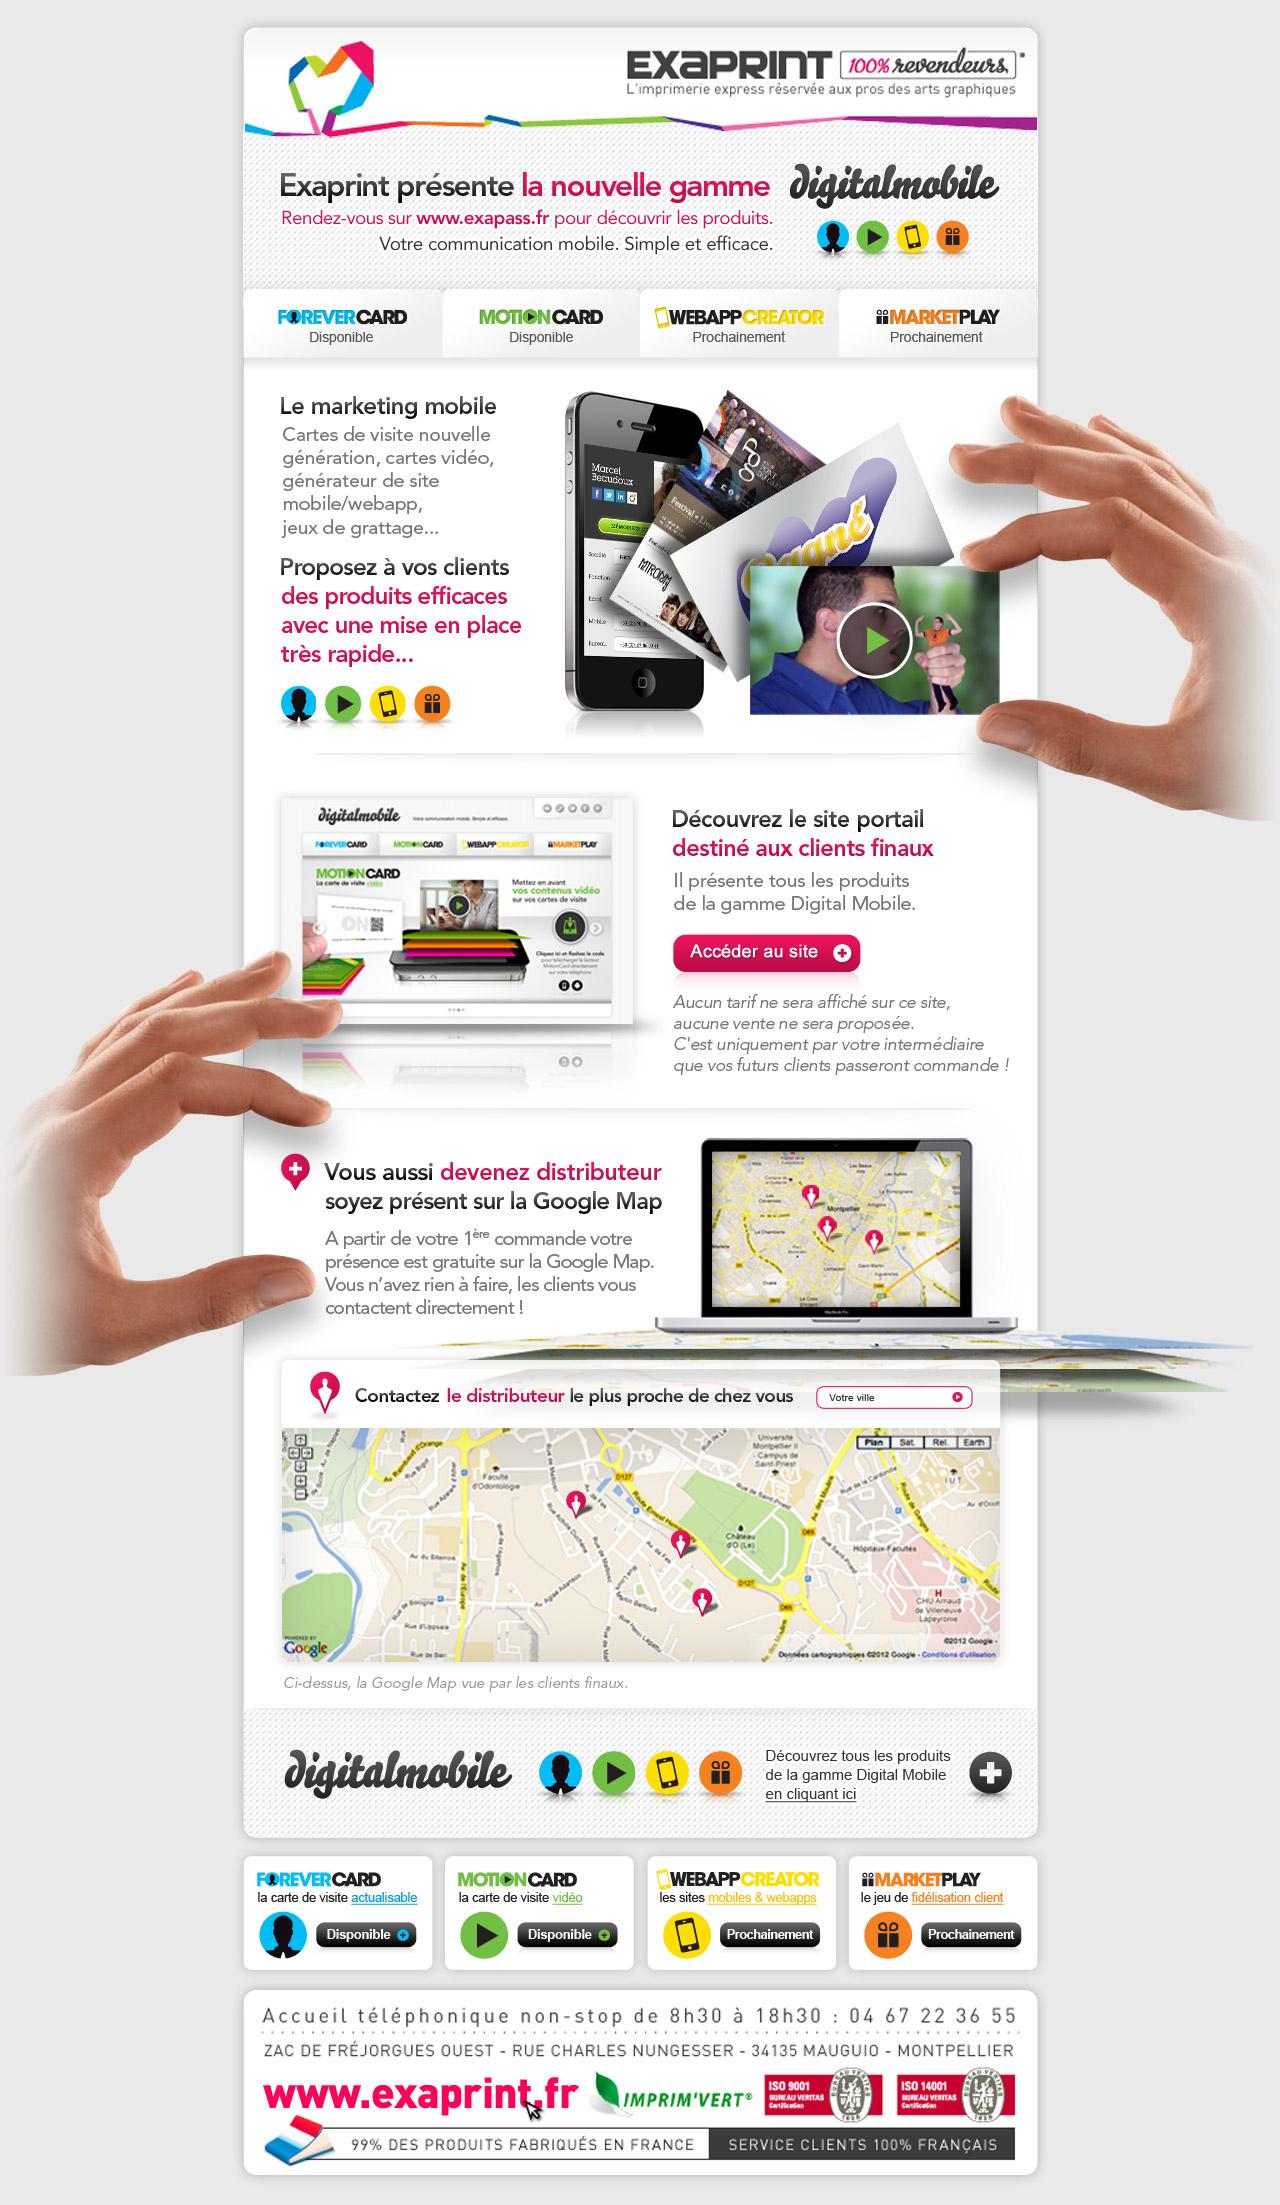 exaprint-digitalmobile-mailing-newsletter-exaprint-creation-communication-caconcept-alexis-cretin-graphiste